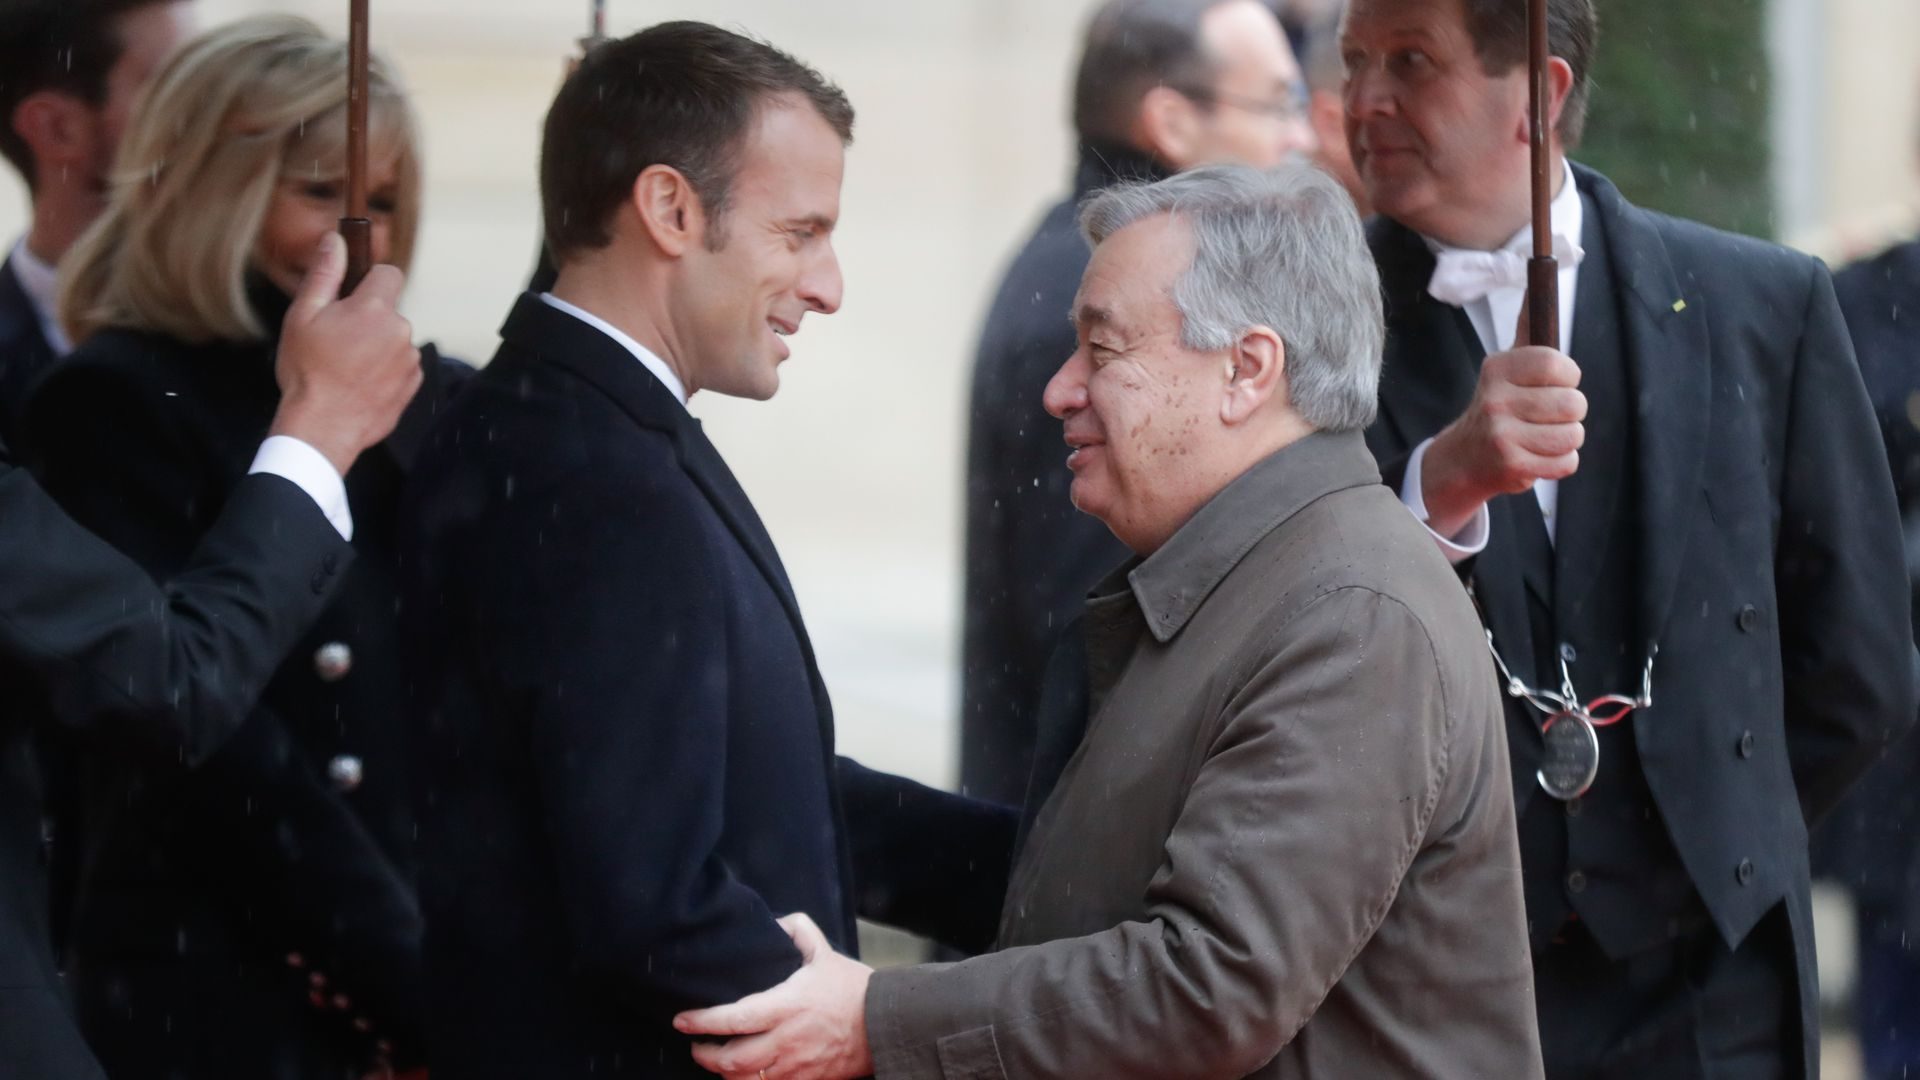 Macron shaking hands with Antonio Guterres